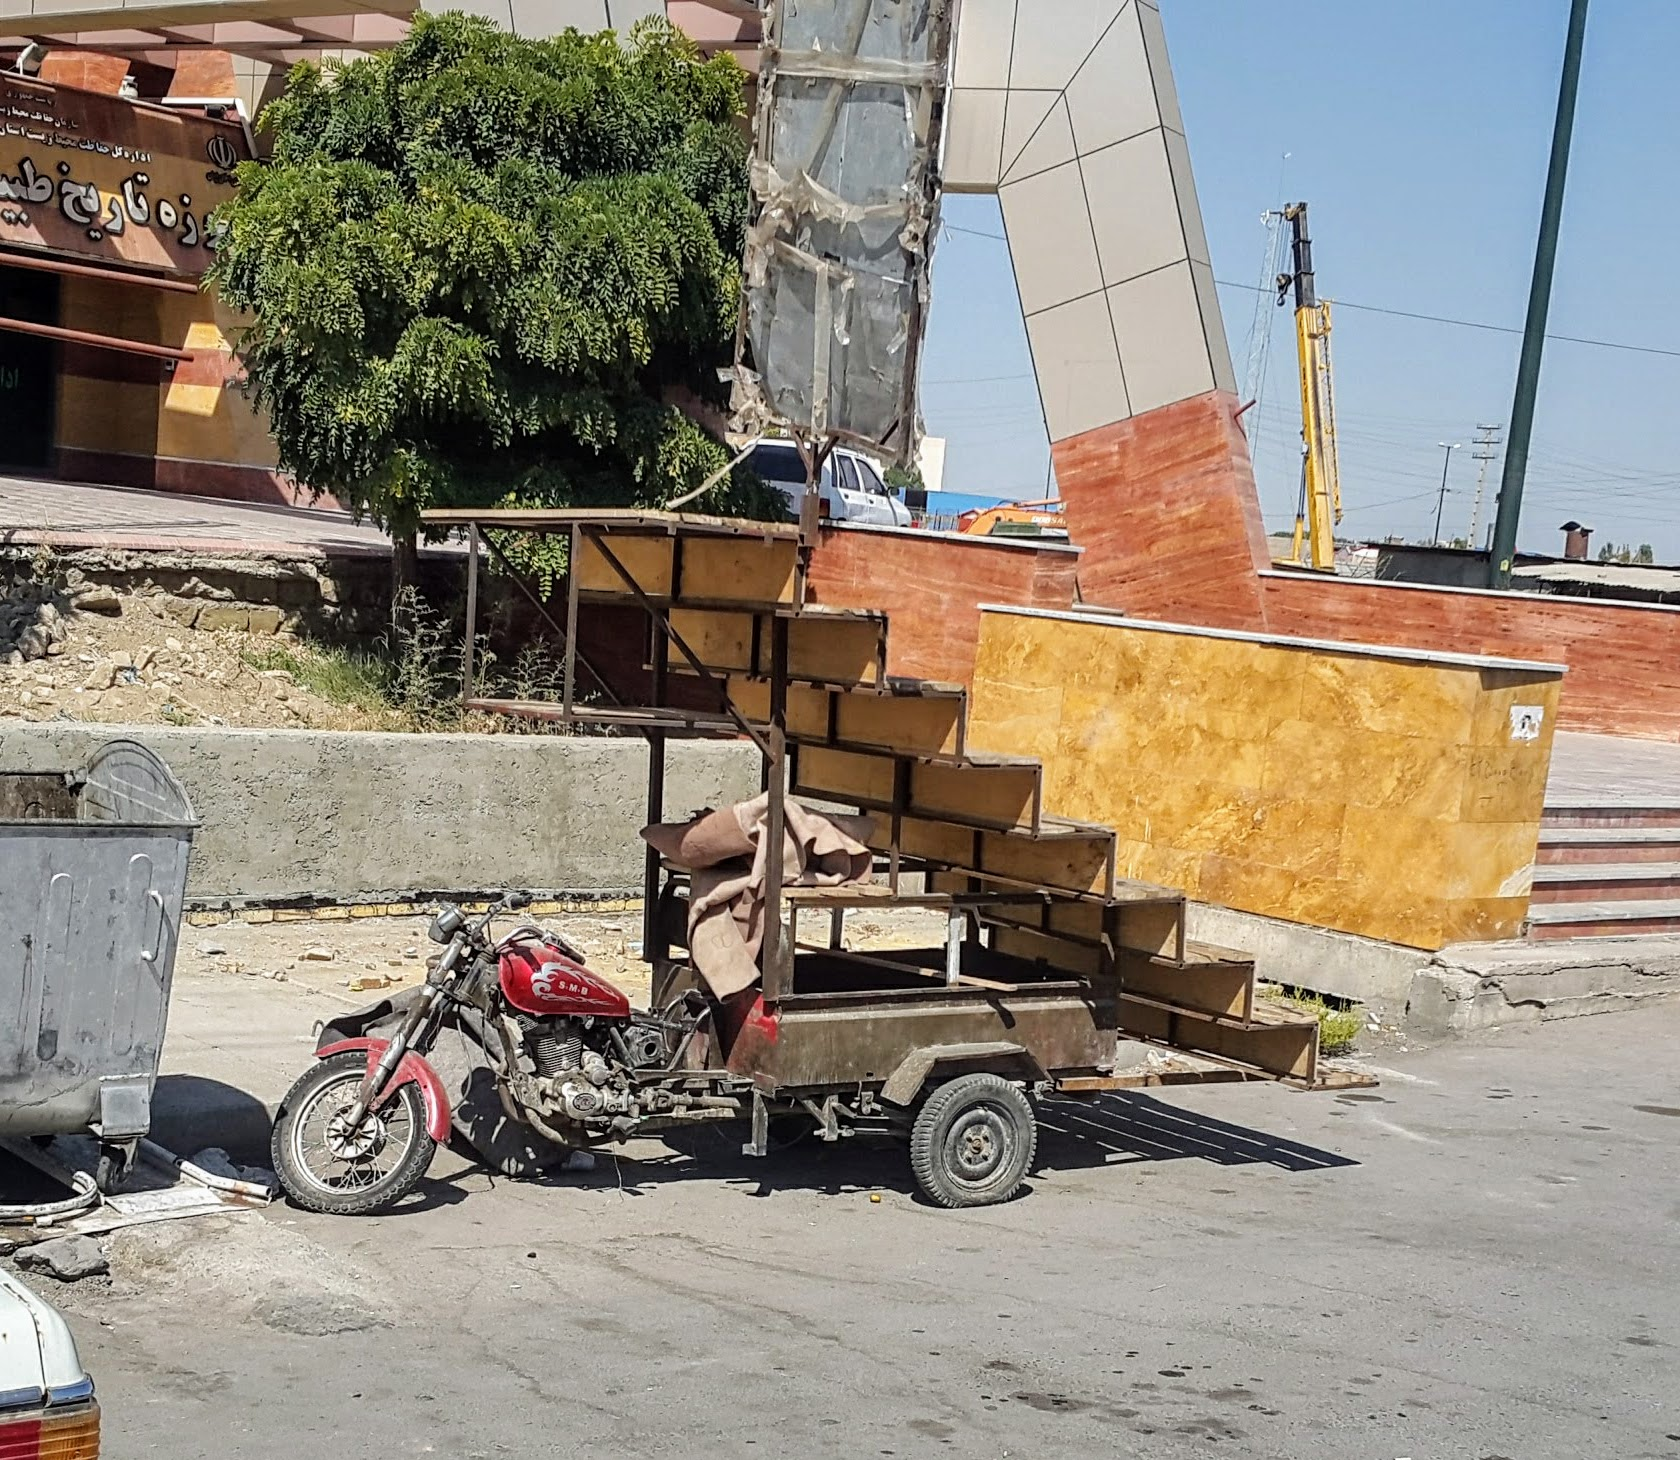 Baustellenfahrzeug in Urmia, Iran